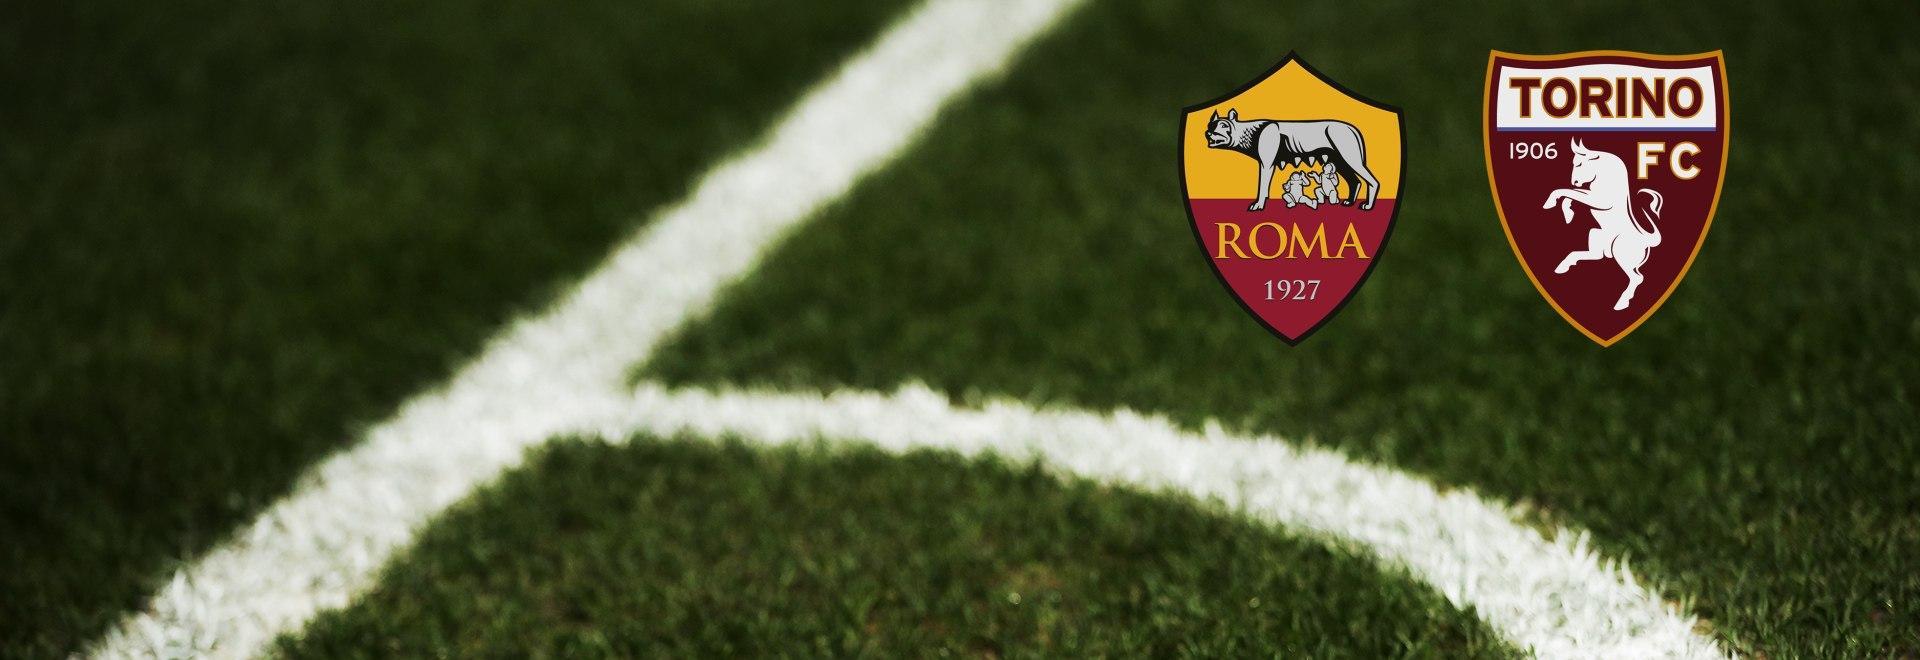 Roma - Torino. 18a g.